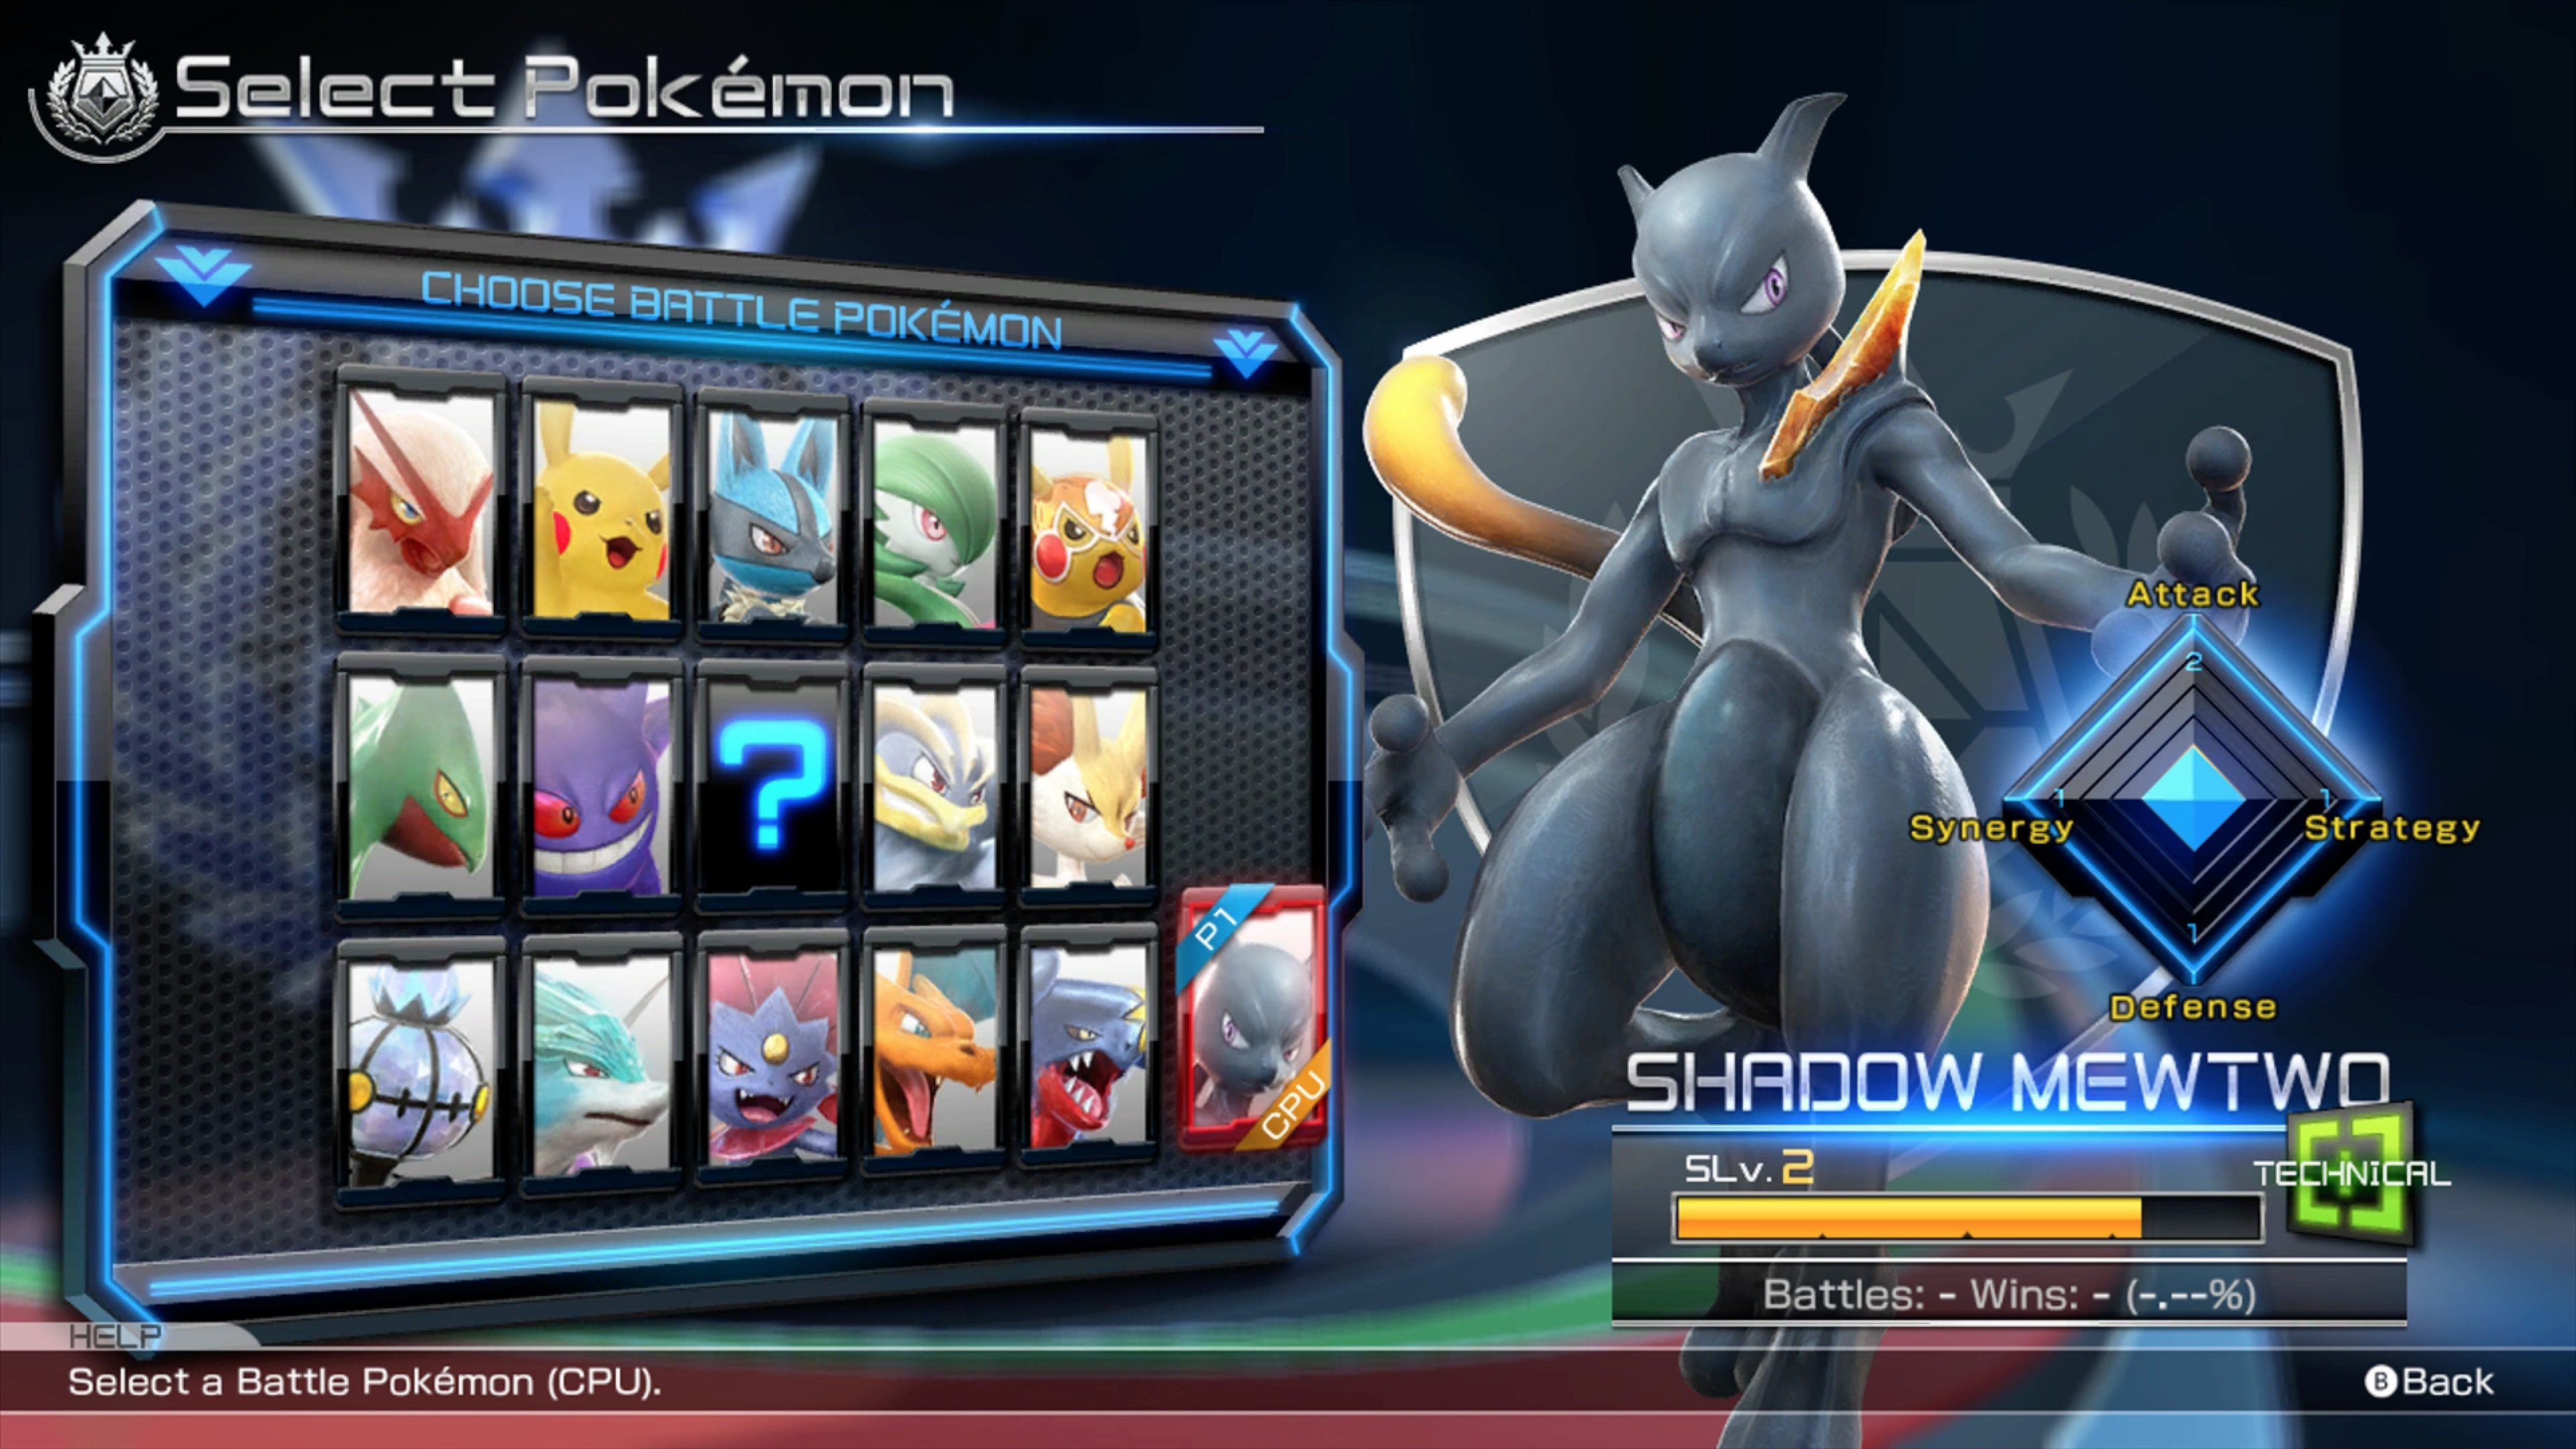 Is Shadow Mewtwo canon? The Pokémon Company won't say